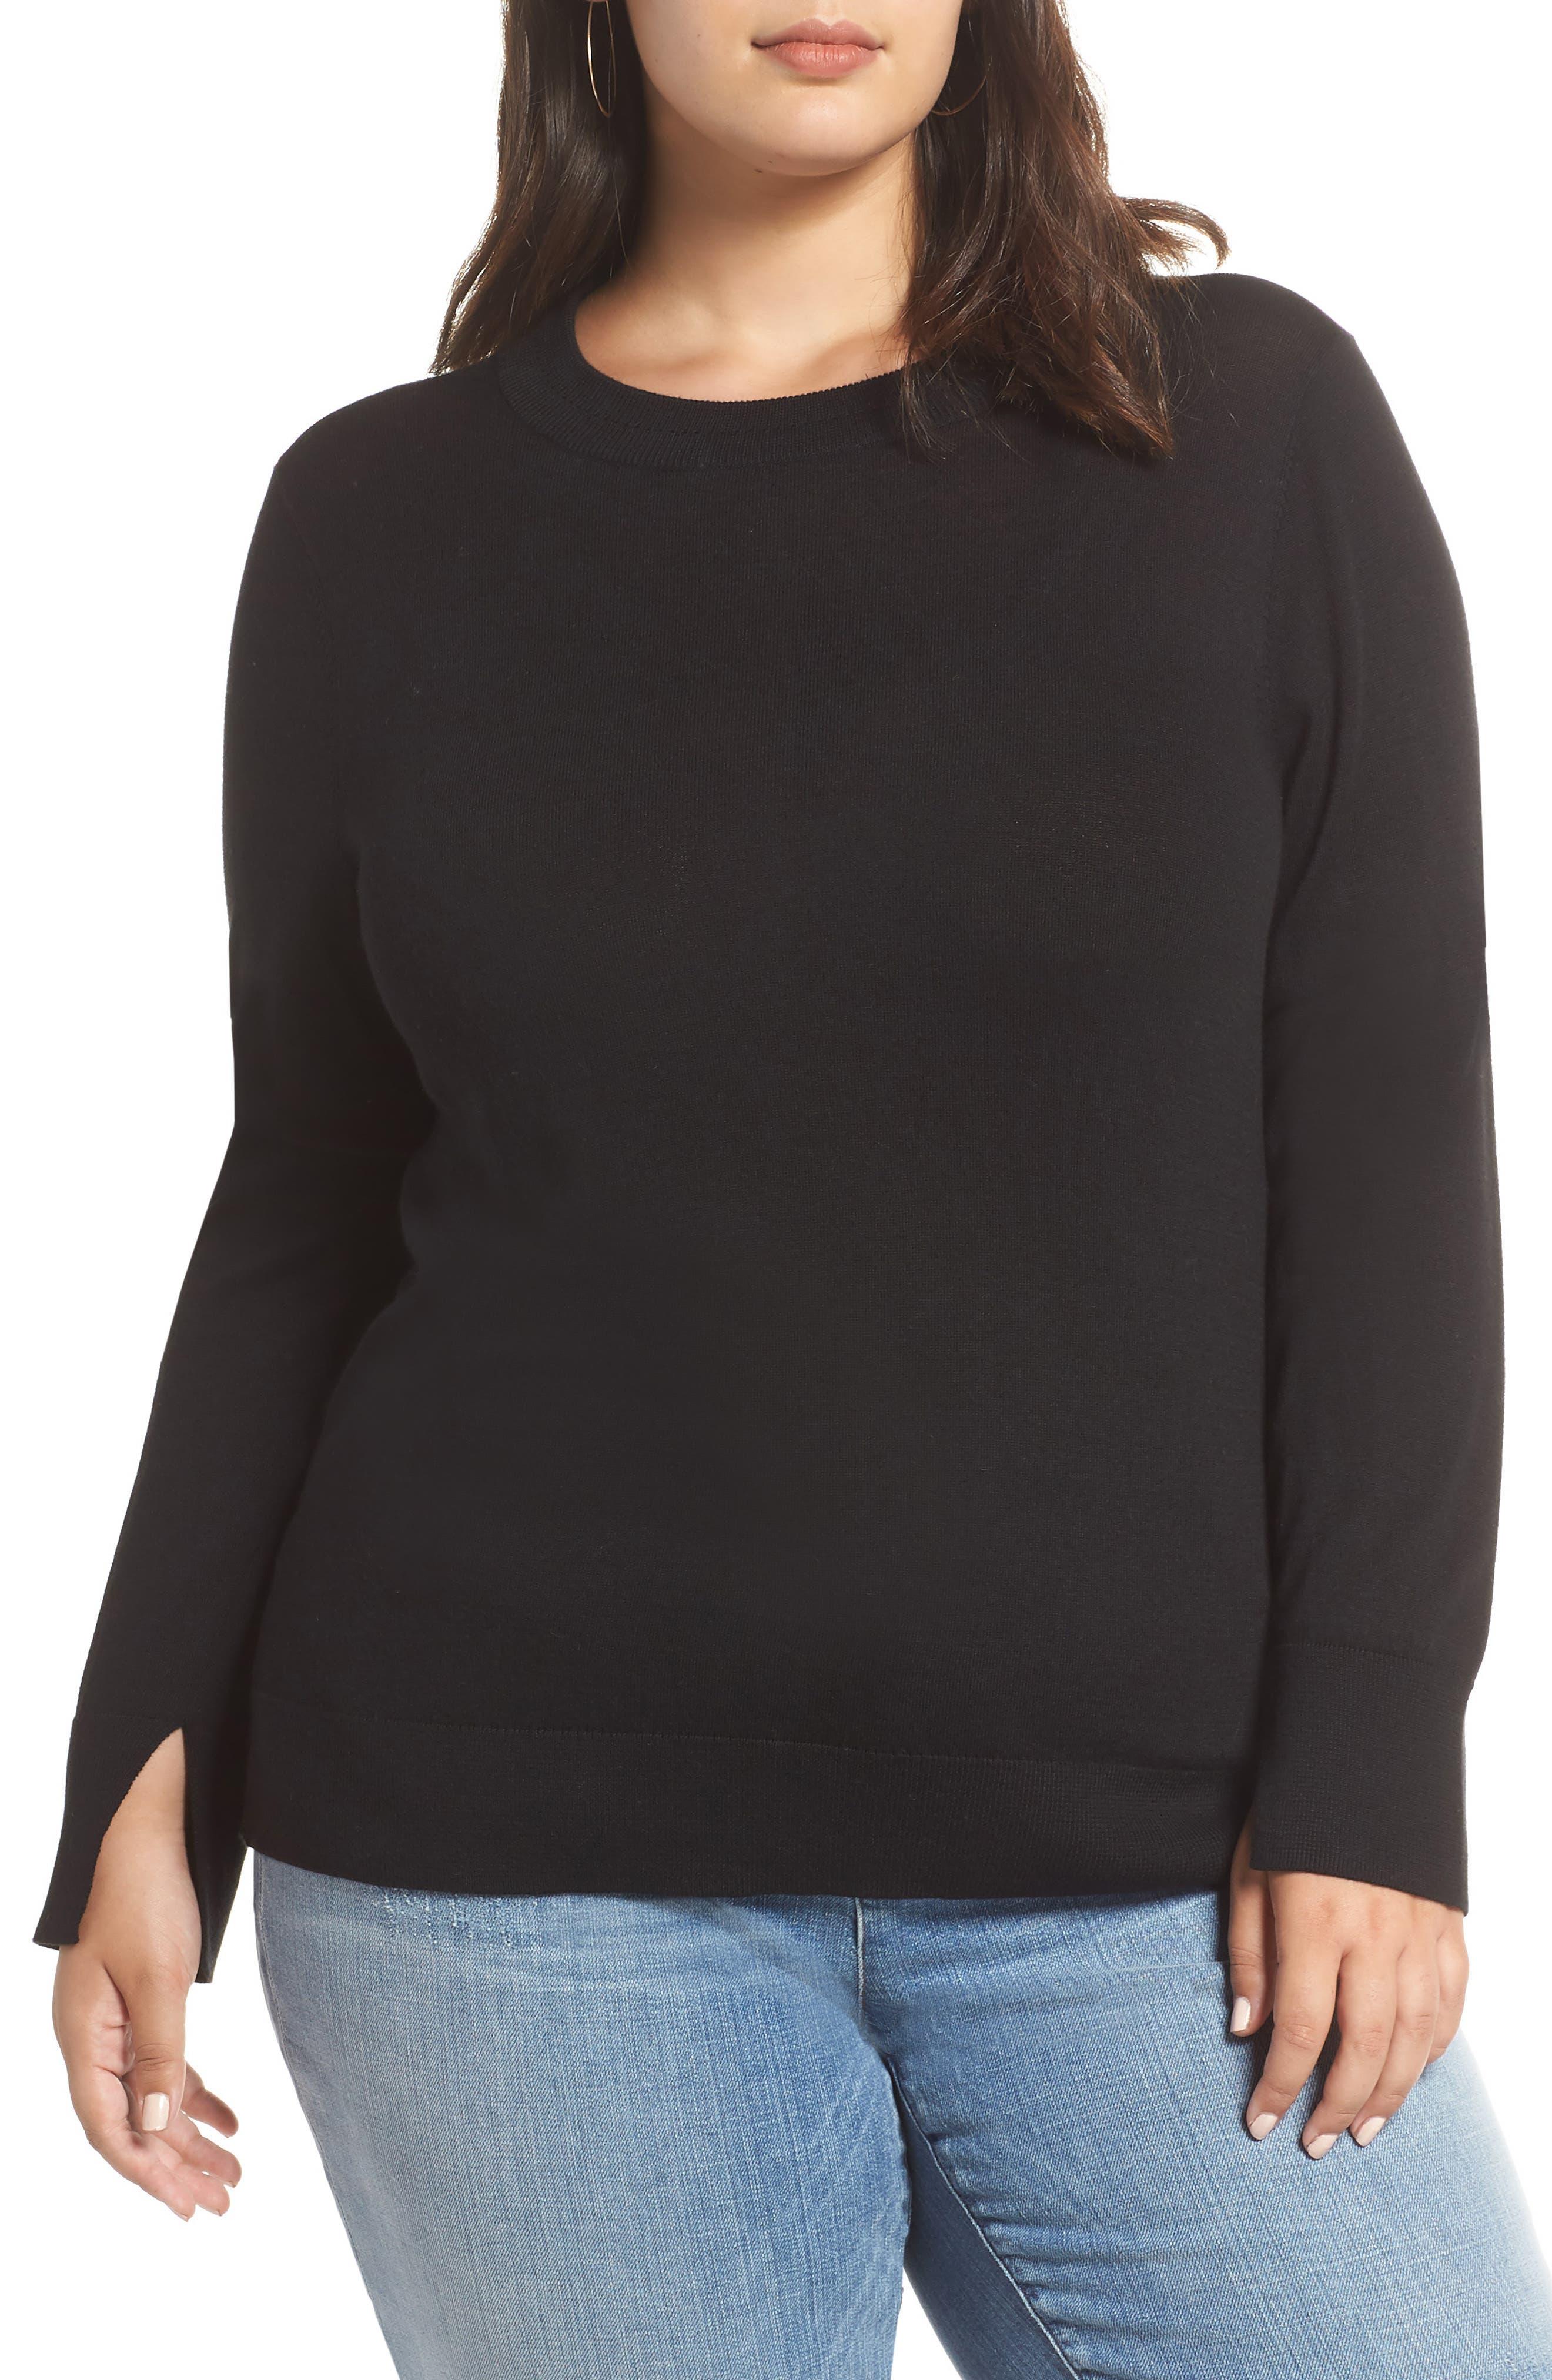 HALOGEN<SUP>®</SUP>, Delta Crewneck Sweater, Main thumbnail 1, color, BLACK